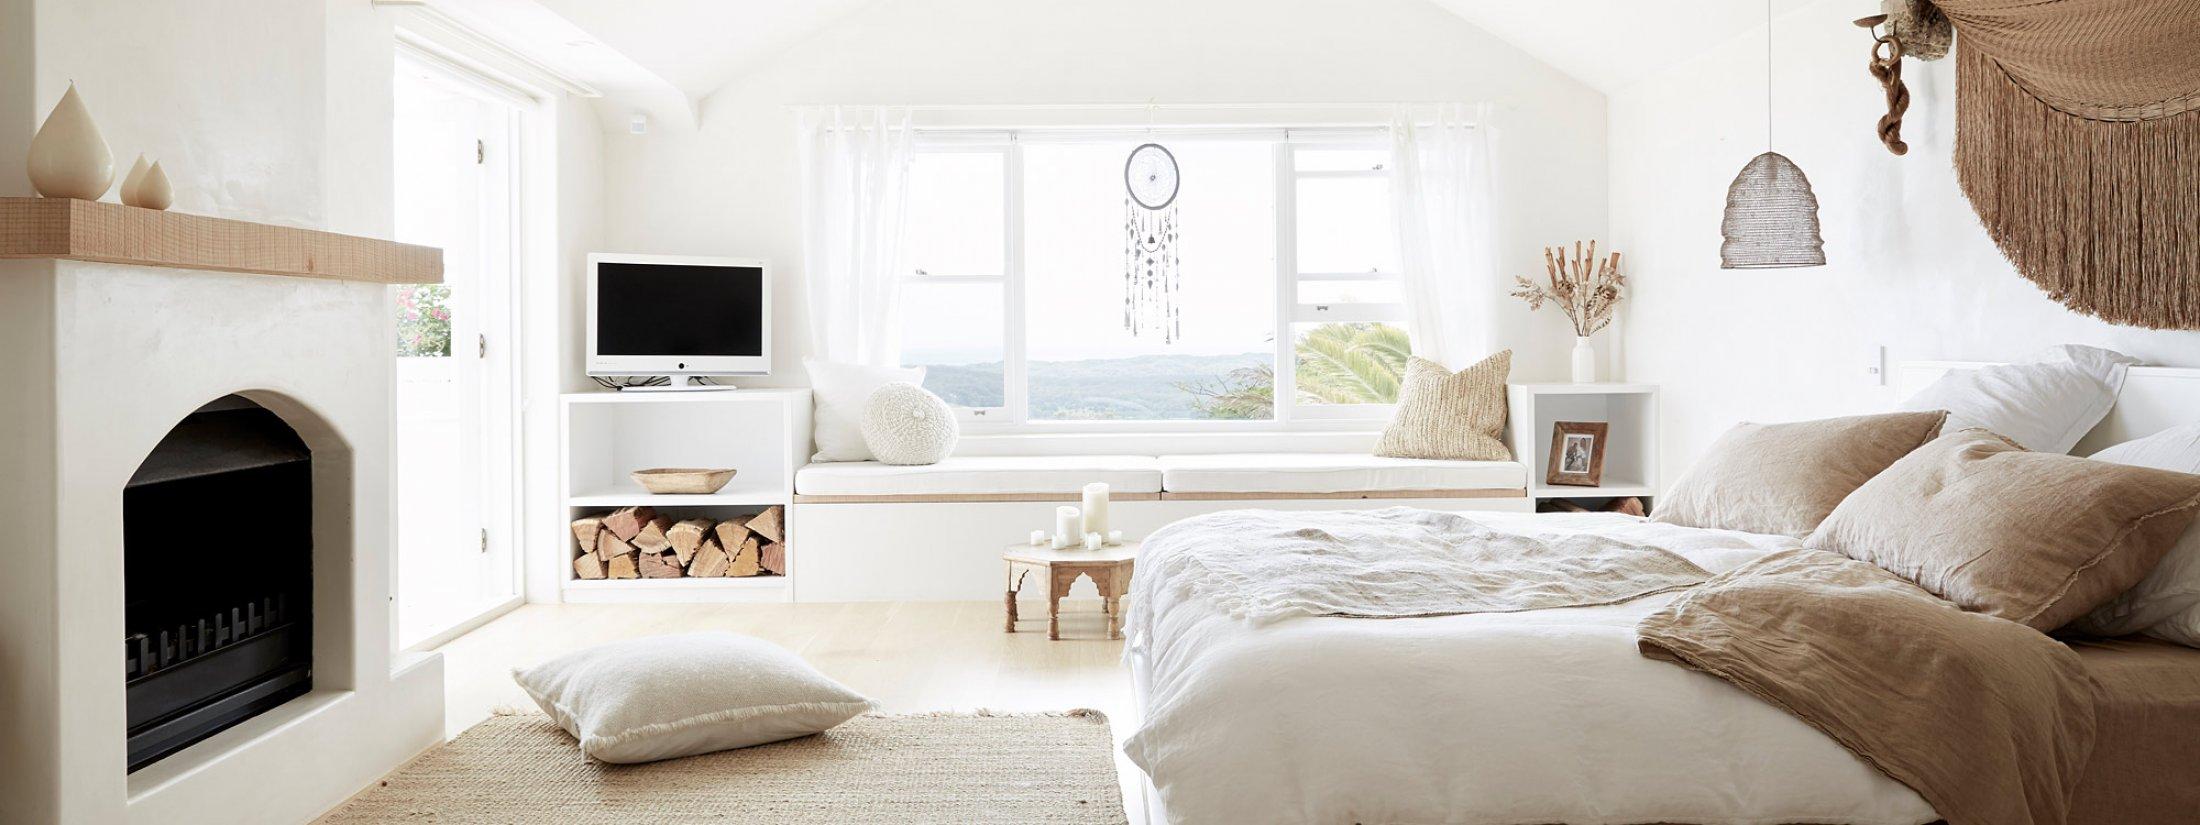 Picadilly House - Byron Bay - Main Bedroom